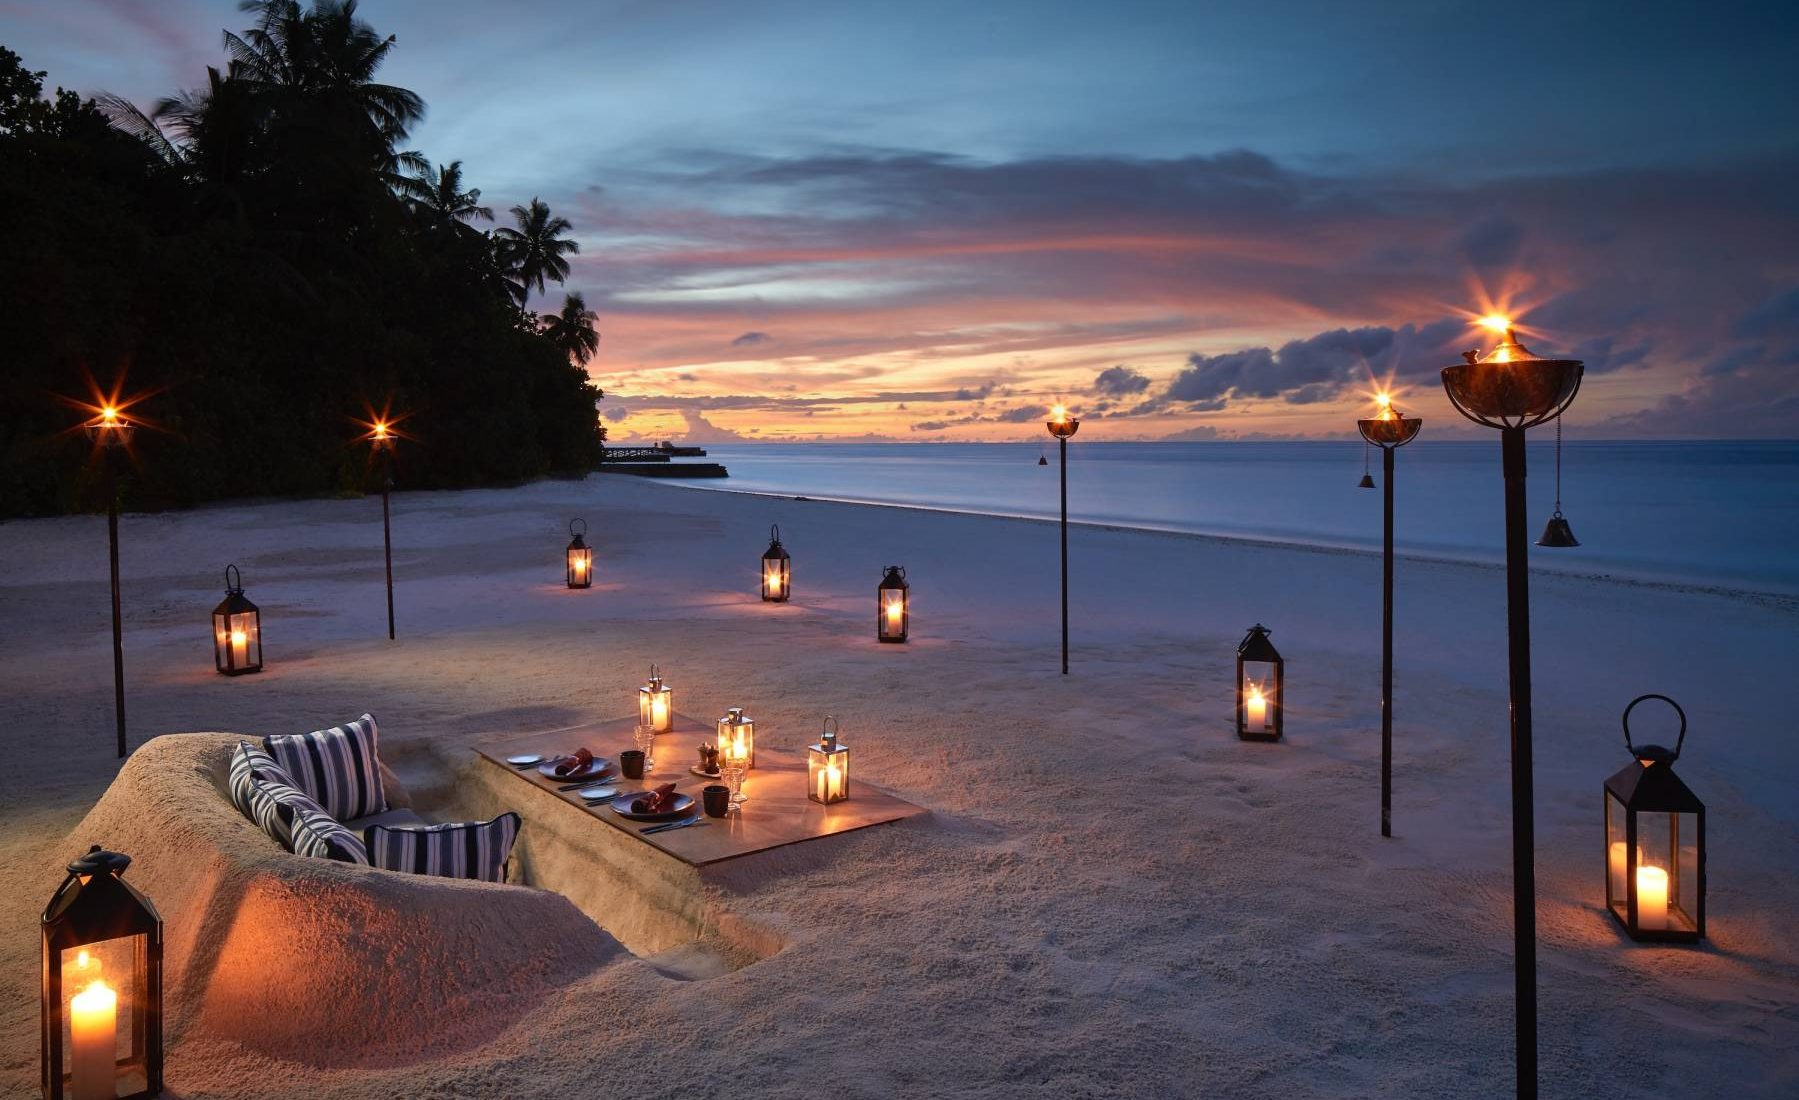 Raffles Maldives Meradhoo - Raffles Maldives Meradhoo